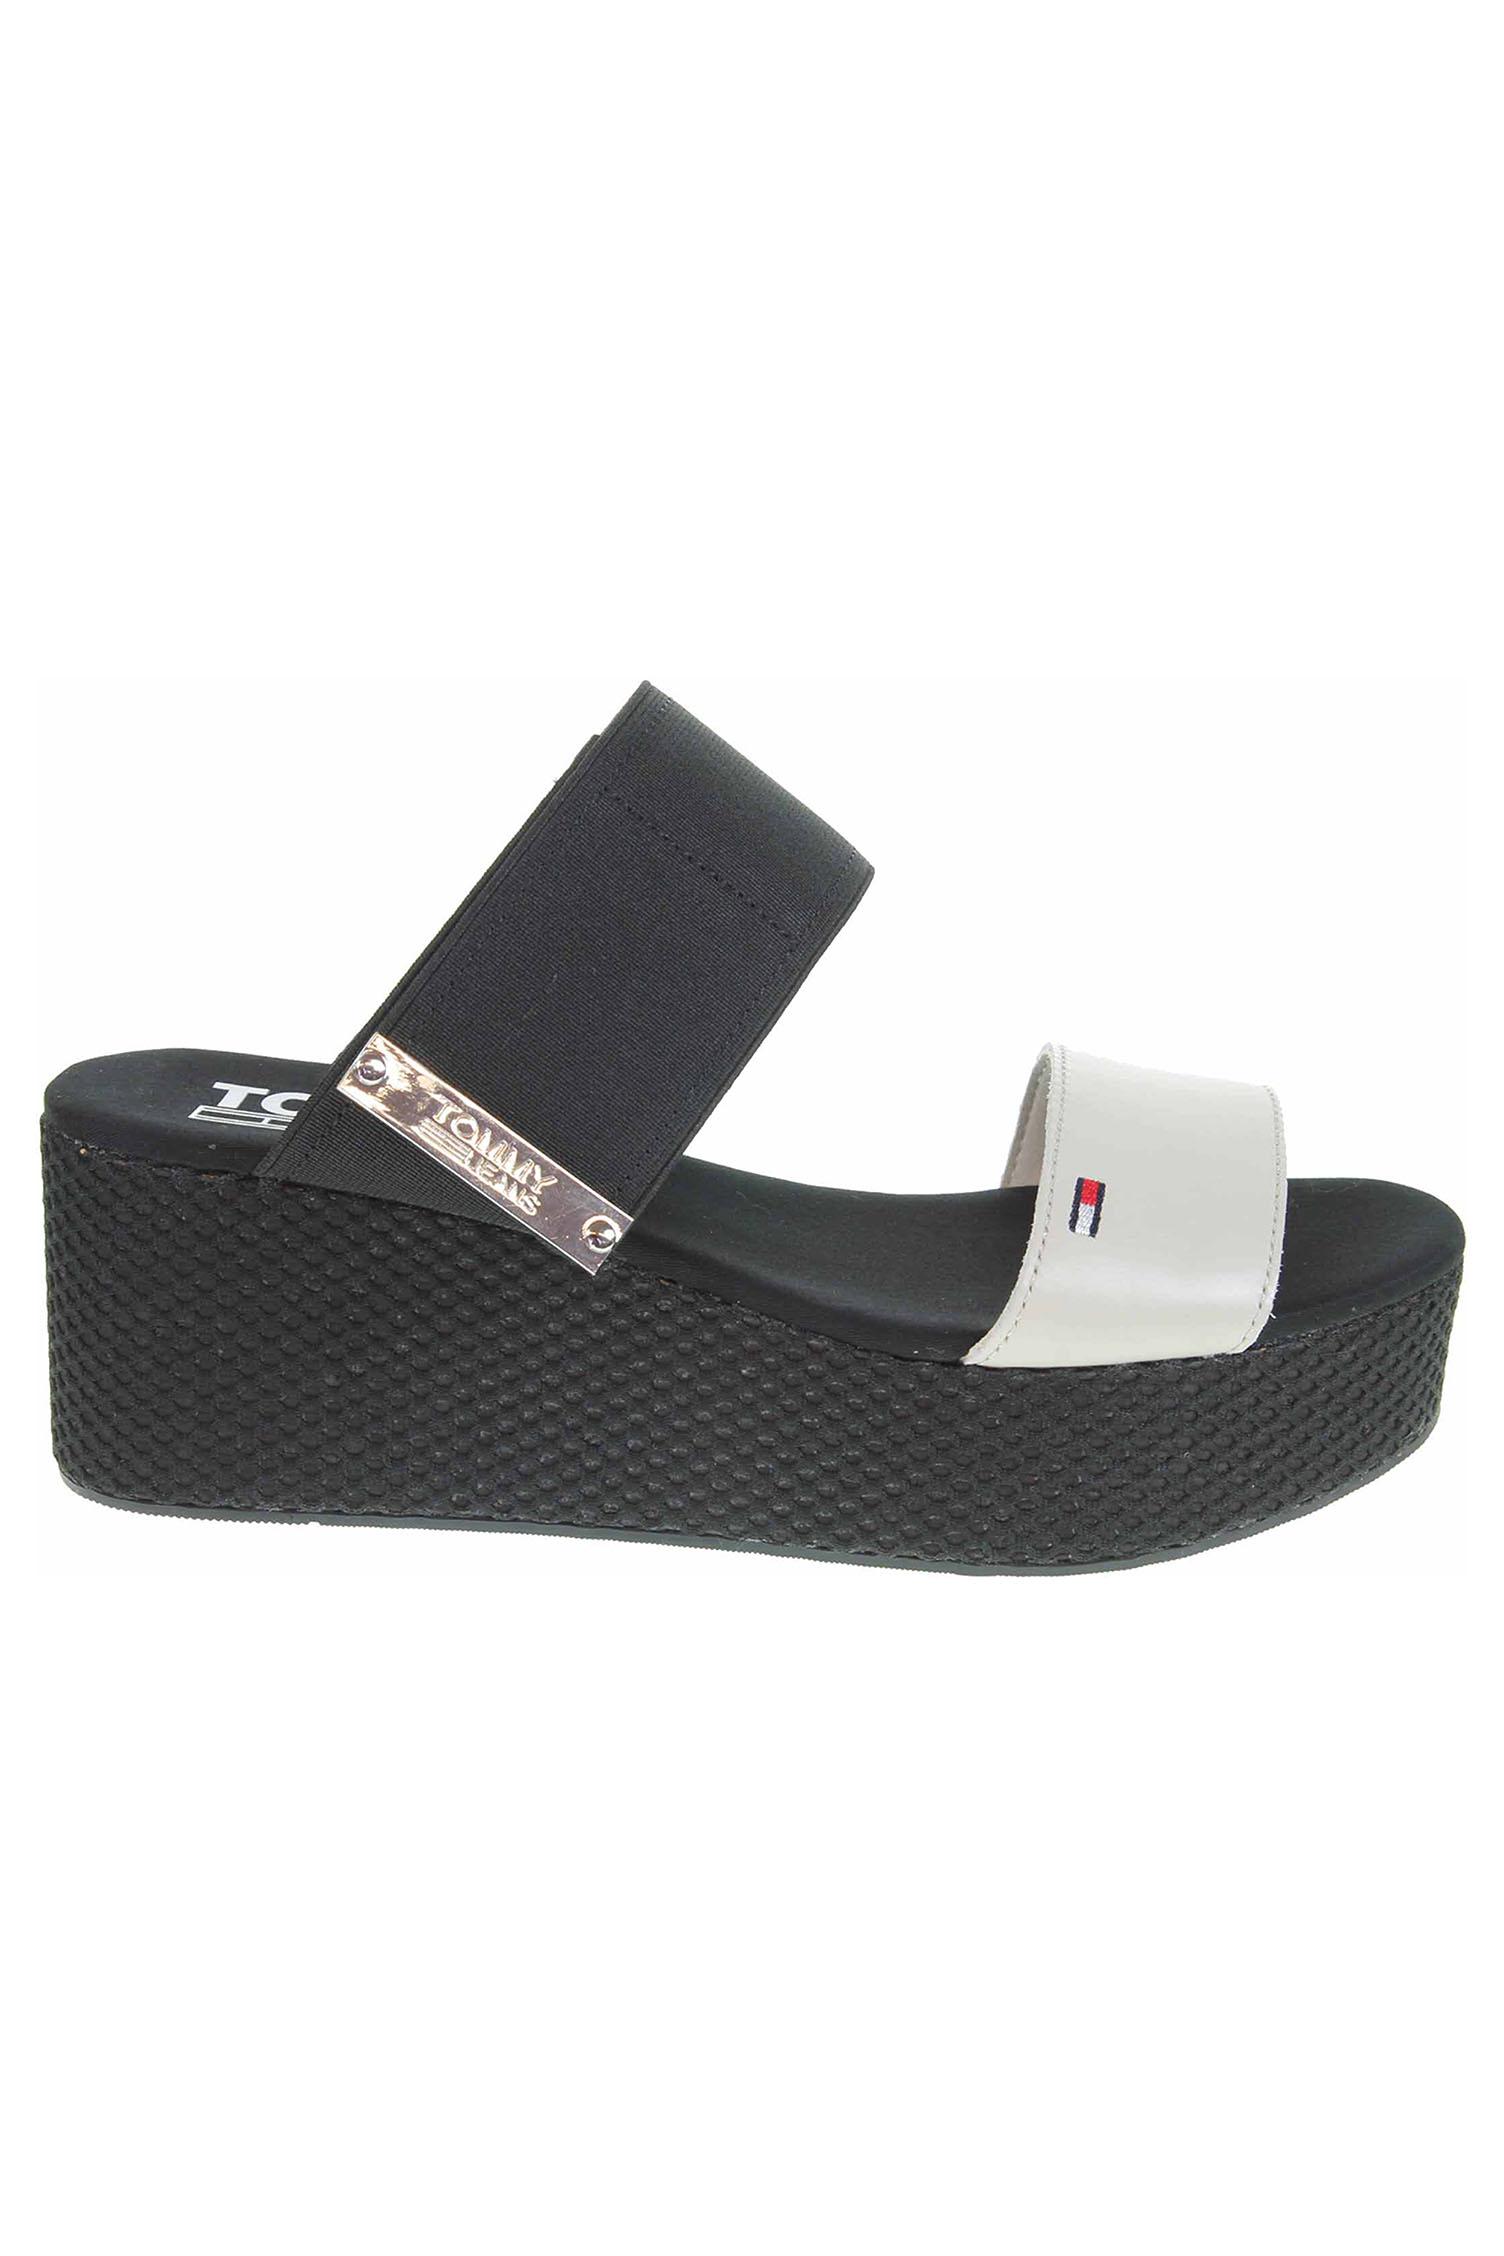 Tommy Hilfiger dámské pantofle EN0EN00217 156 off white EN0EN00217 156. 1 379ee8841d